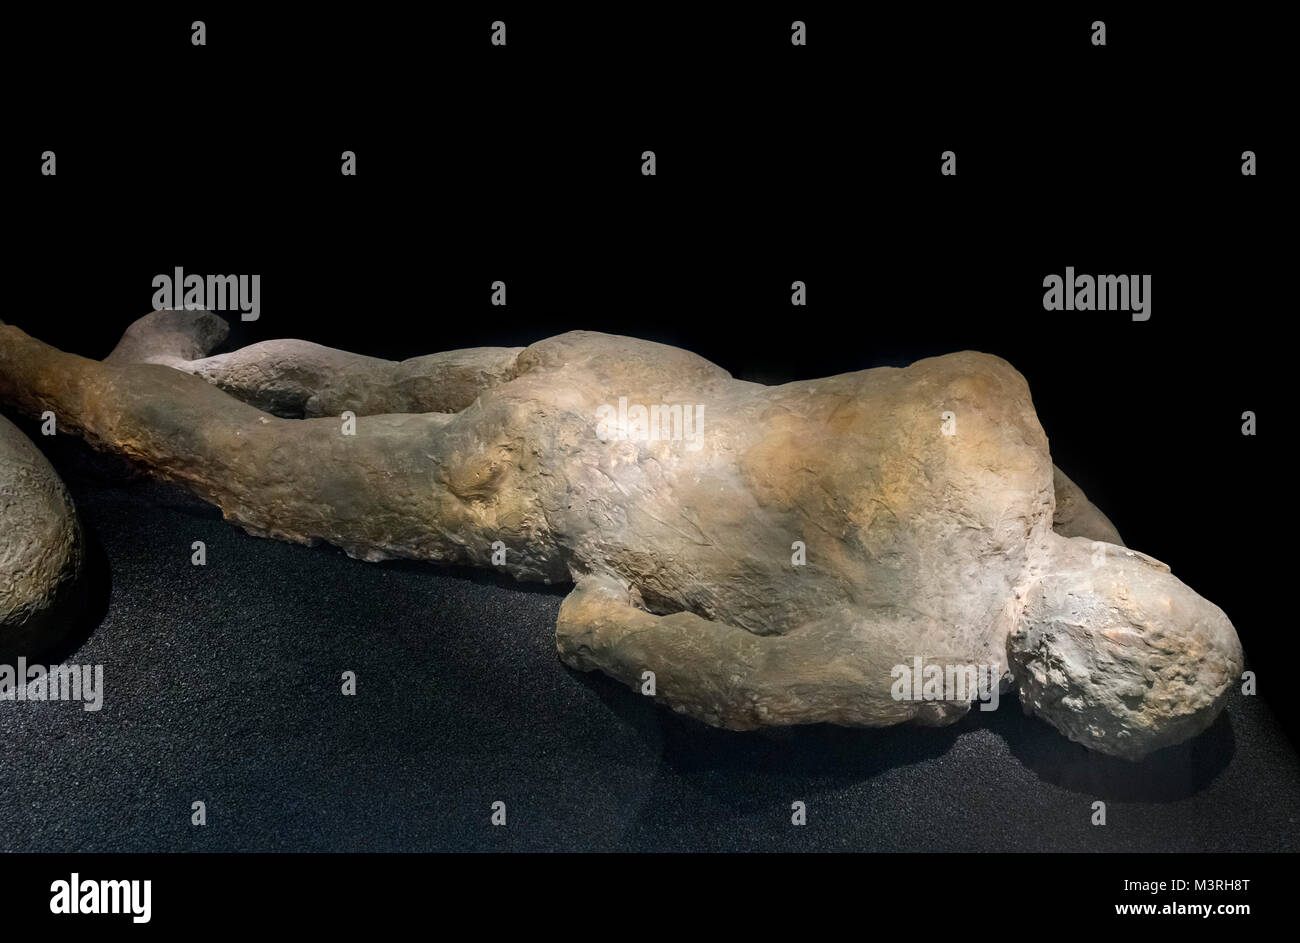 Der Körper des Opfers aus Pompeji nach dem Ausbruch des Vesuv im AD 79, Natural History Museum, London, England, Stockbild